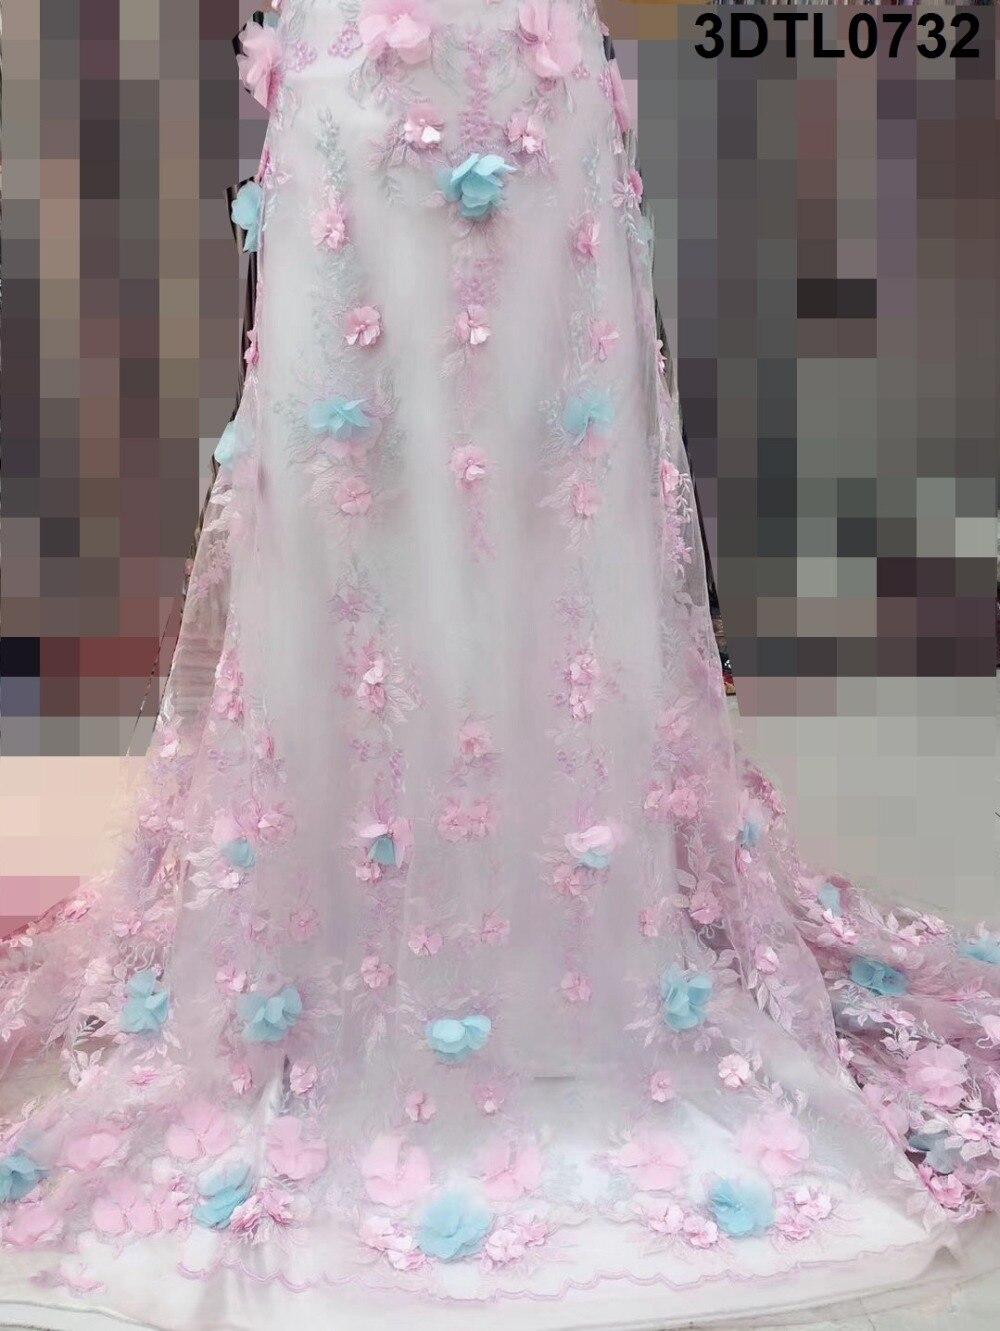 Розовая африканская кружевная ткань 2019 3D Цветы из бисера тюль кружевная ткань высокого качества красивая французская Тюль кружевная ткань